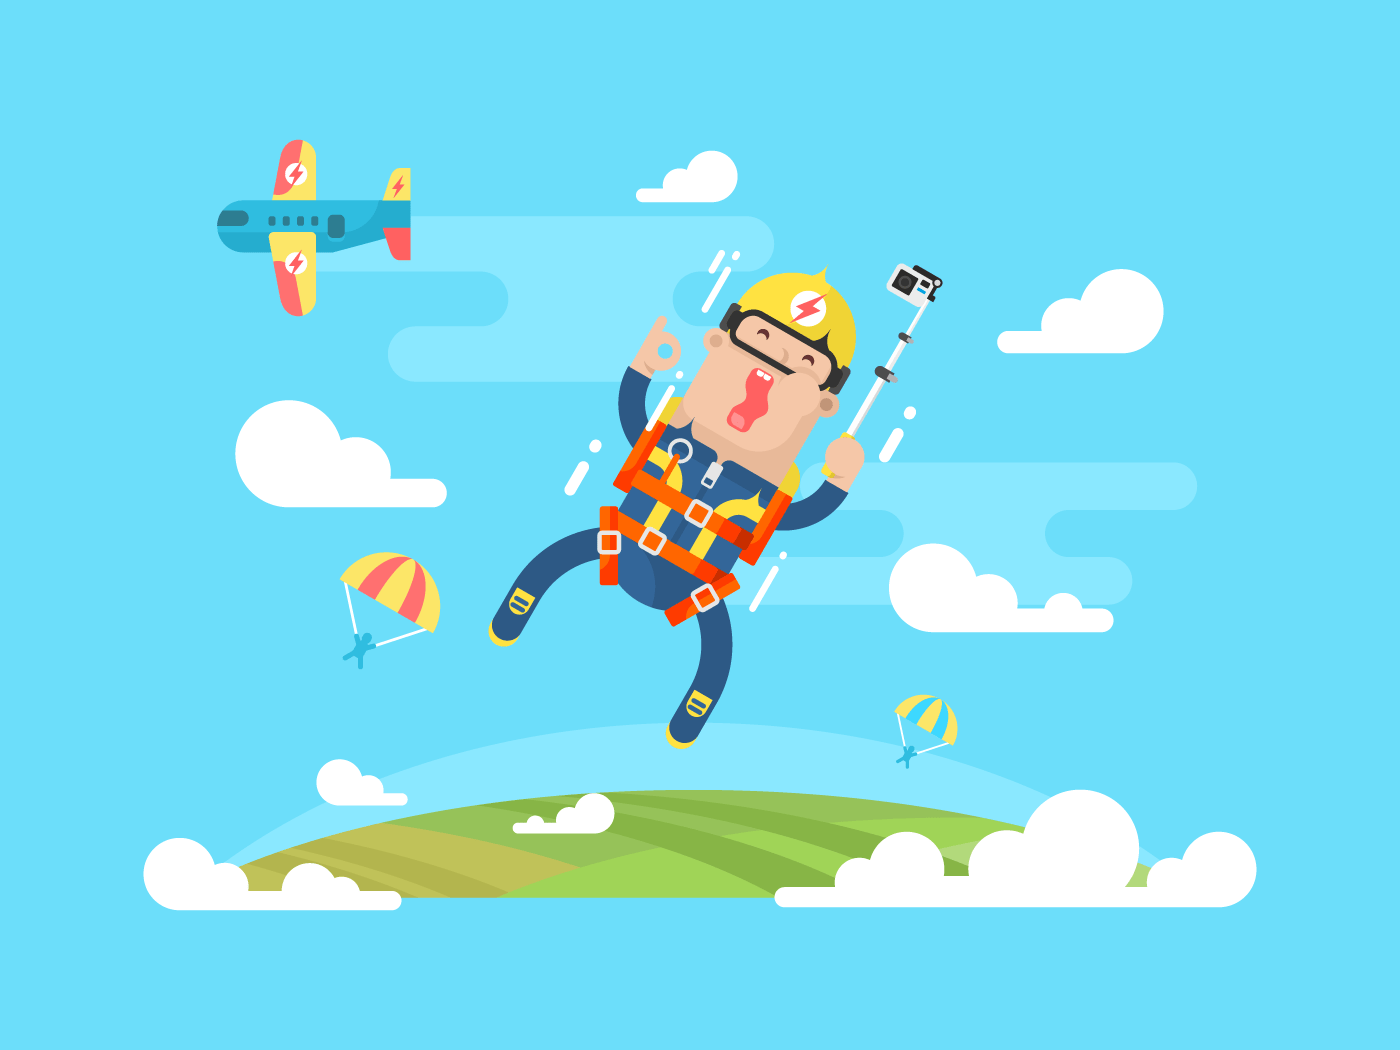 Skydiving sport flat vector illustration